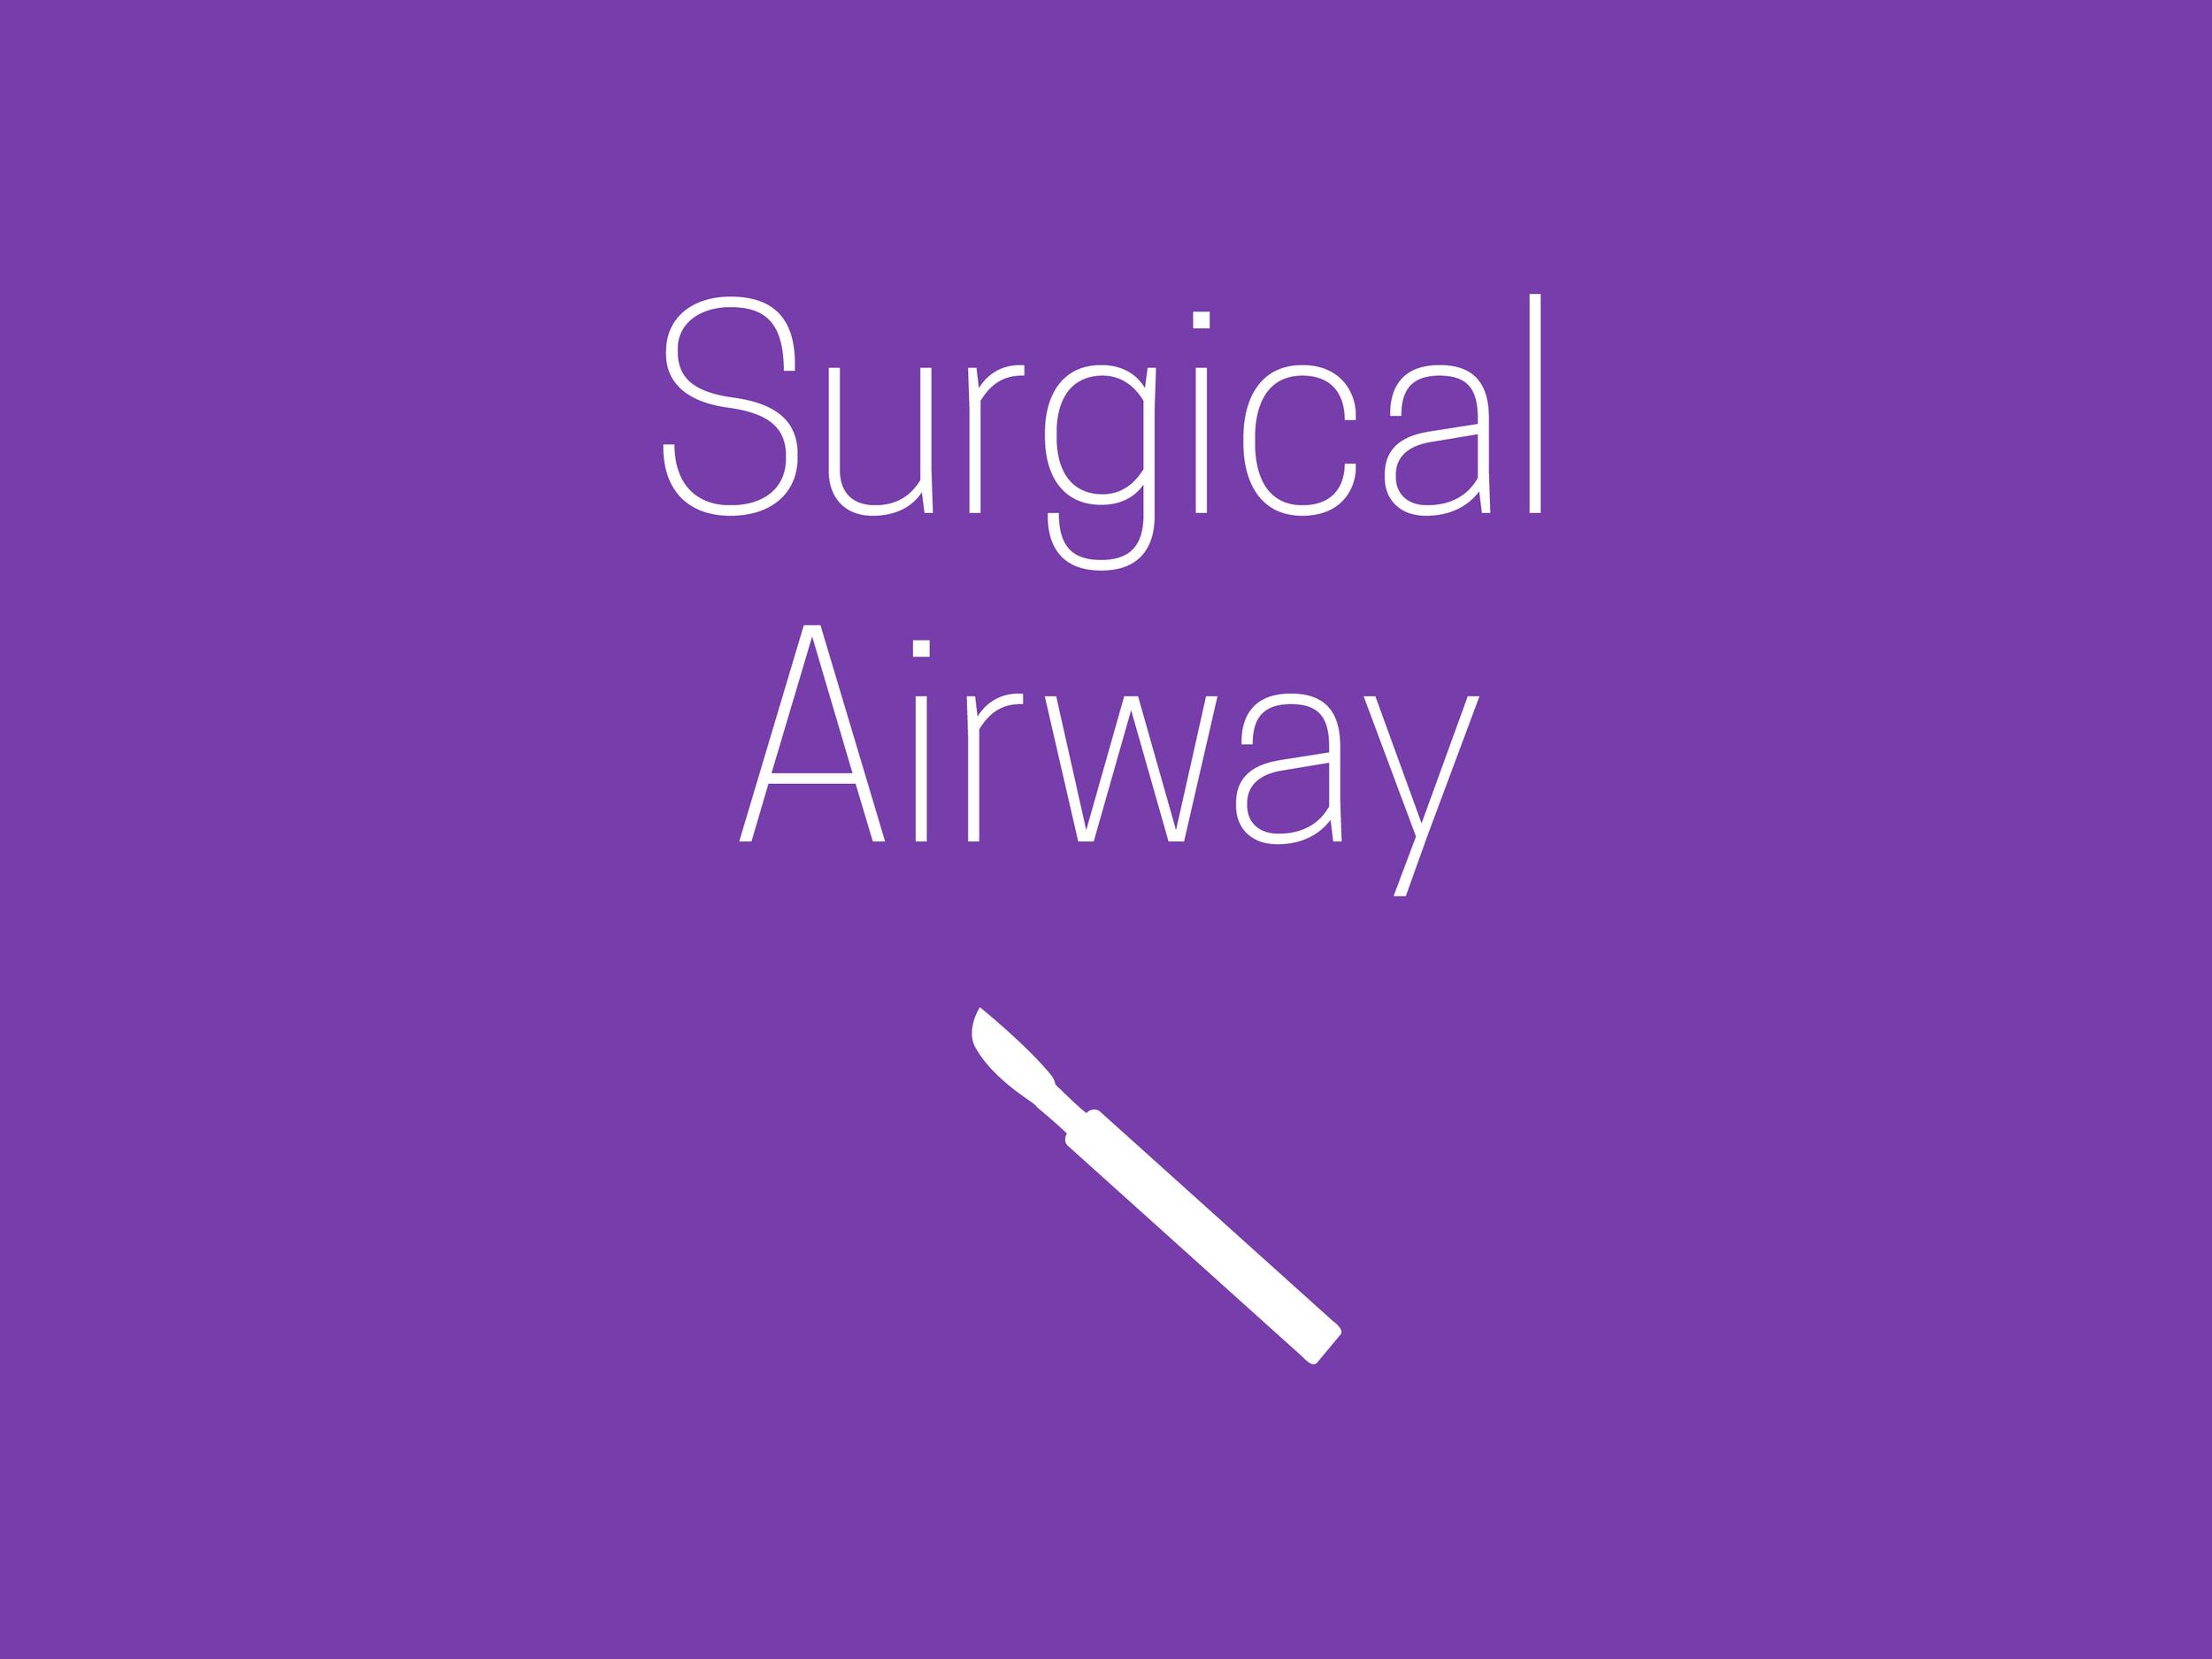 AirwayLit_CategoryArt-08.png